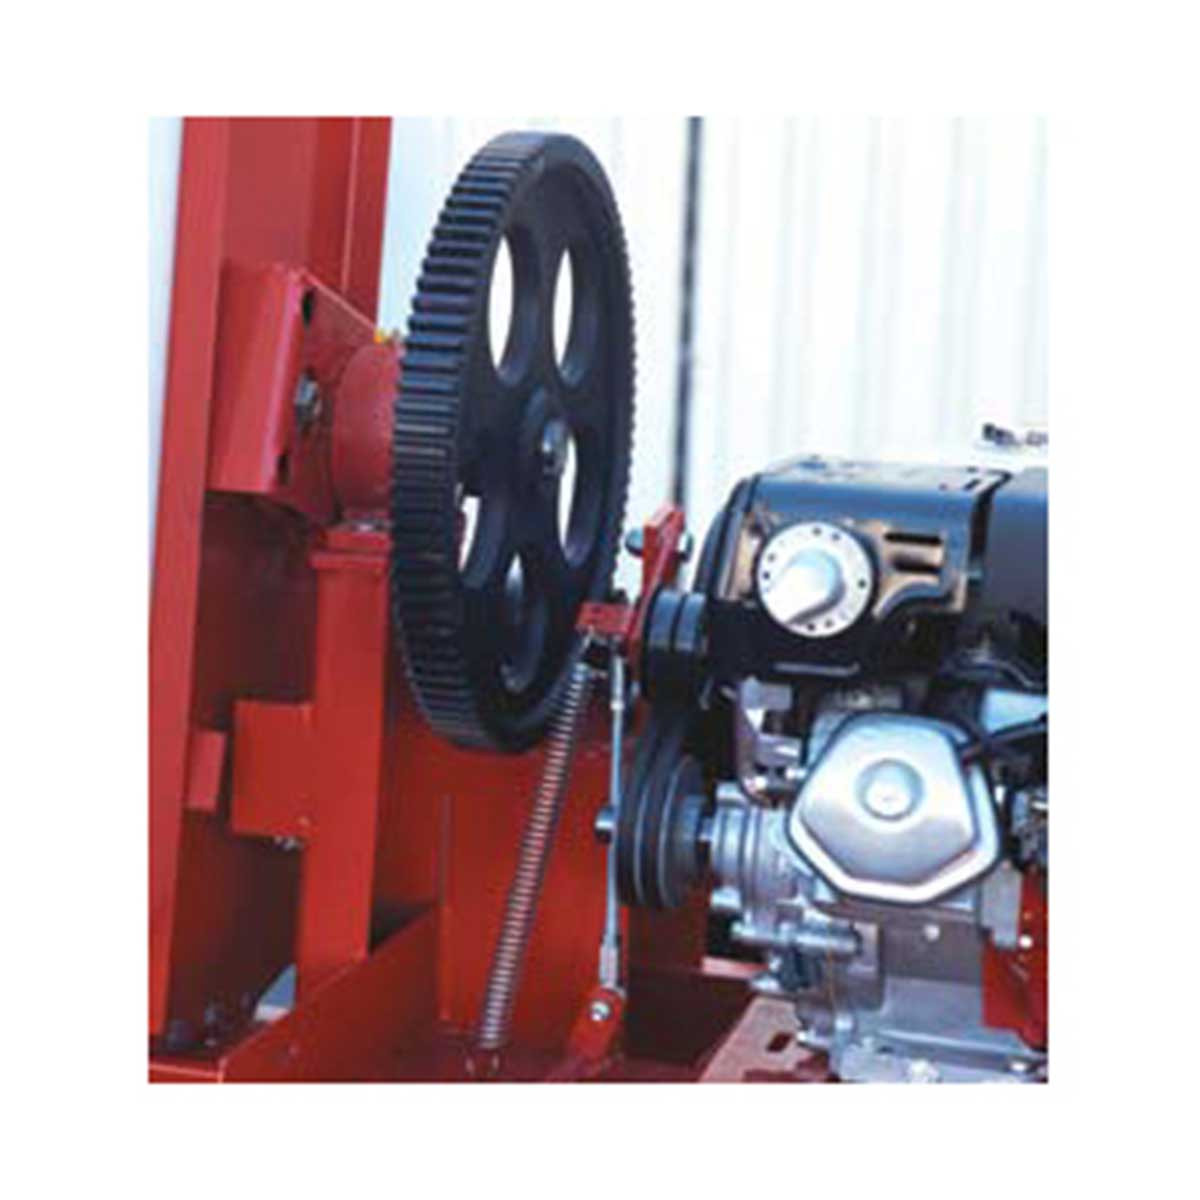 Multiquip Whiteman Mixer gears